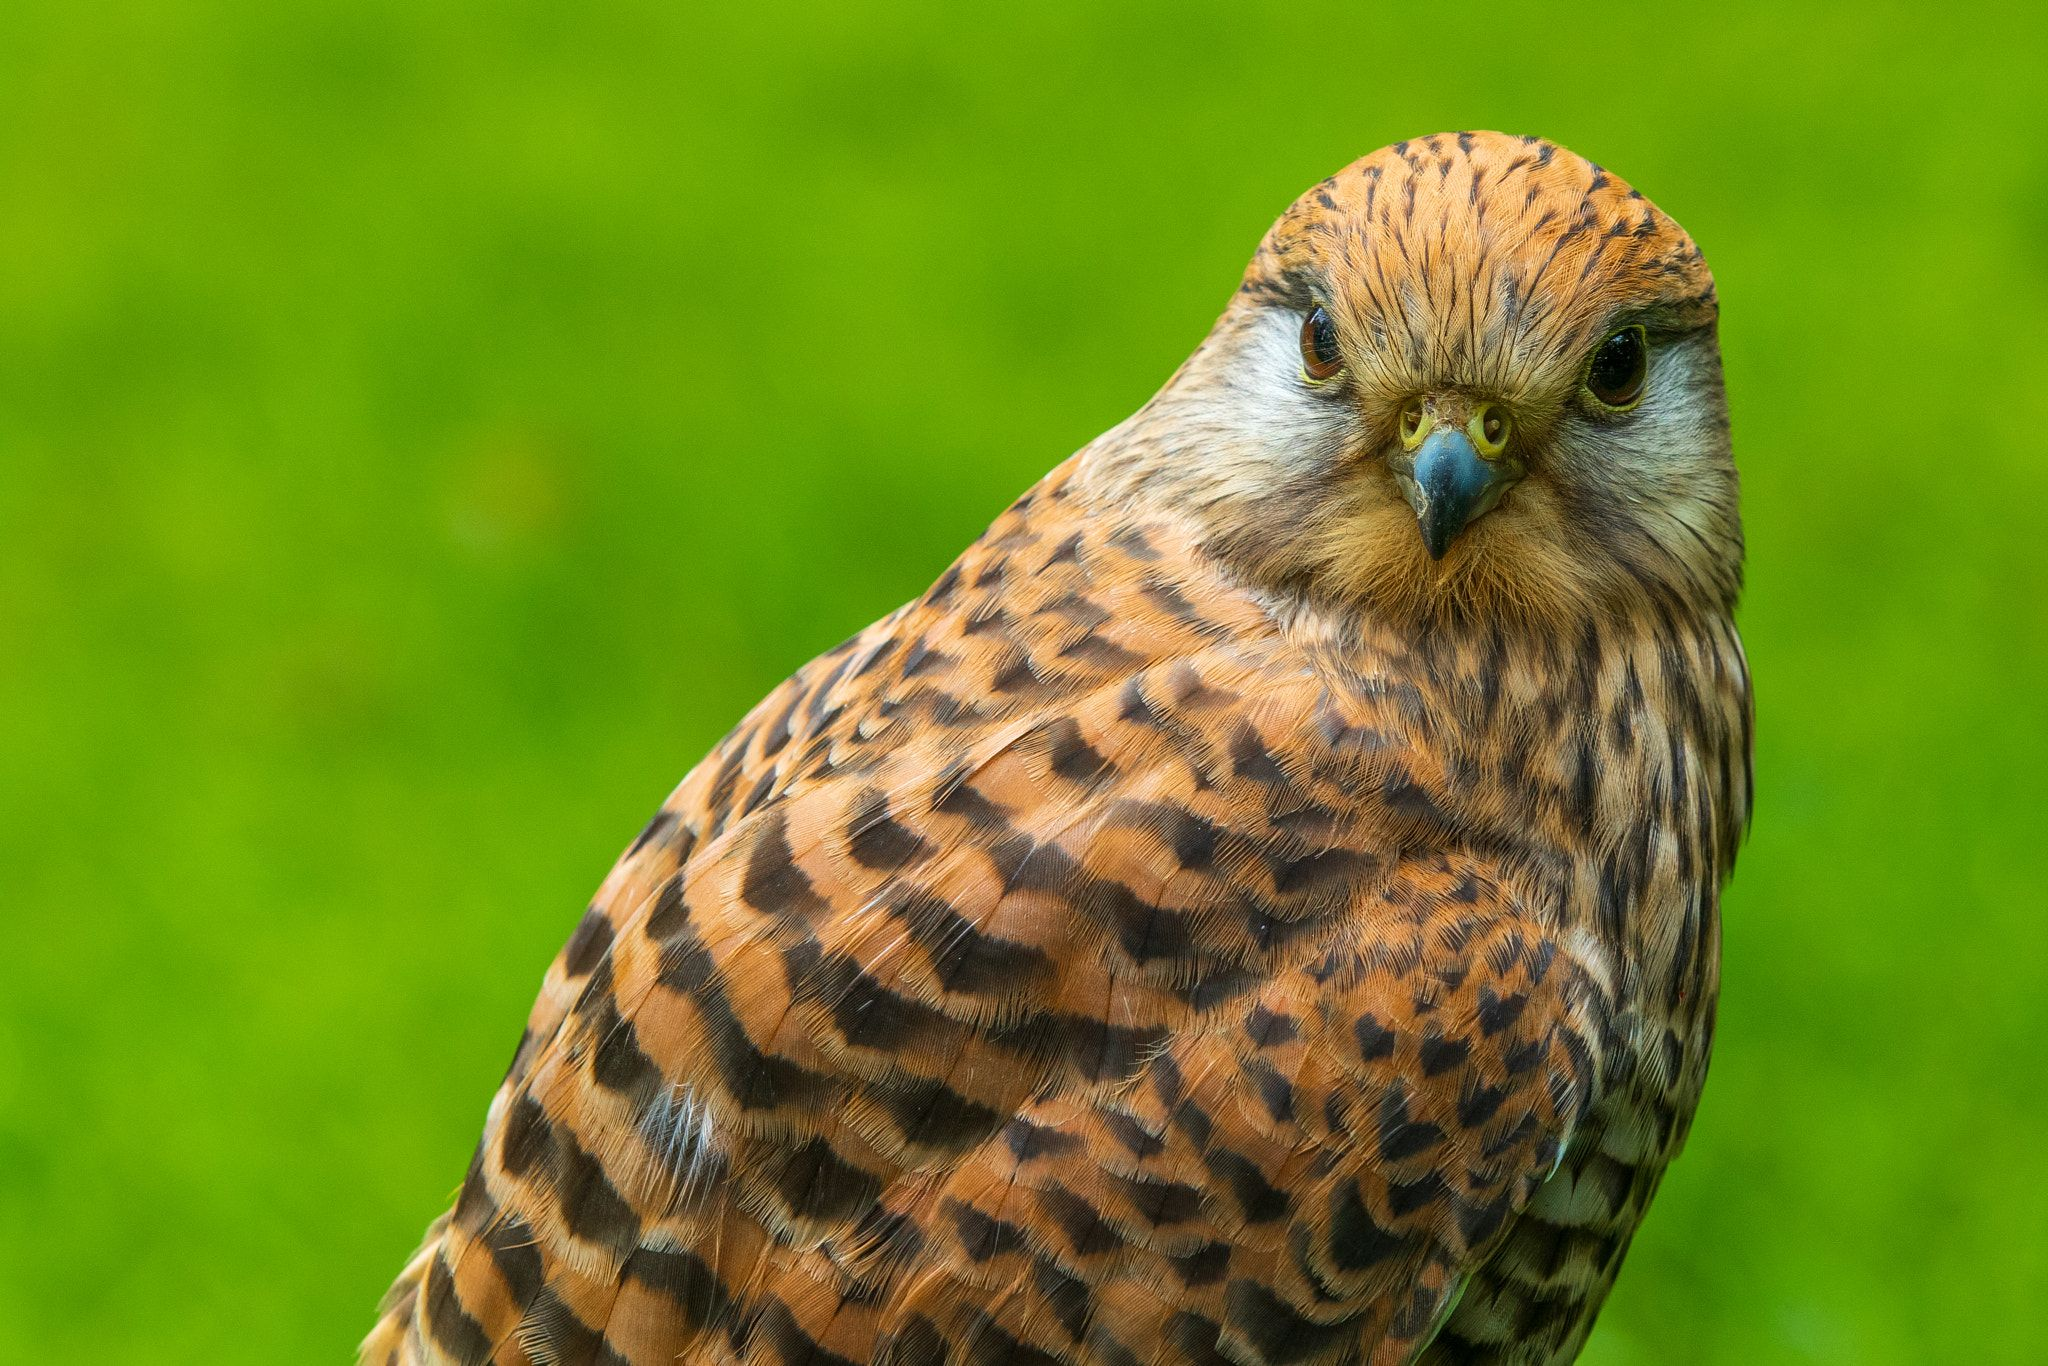 kestrel The common kestrel (Falco tinnunculus) perched